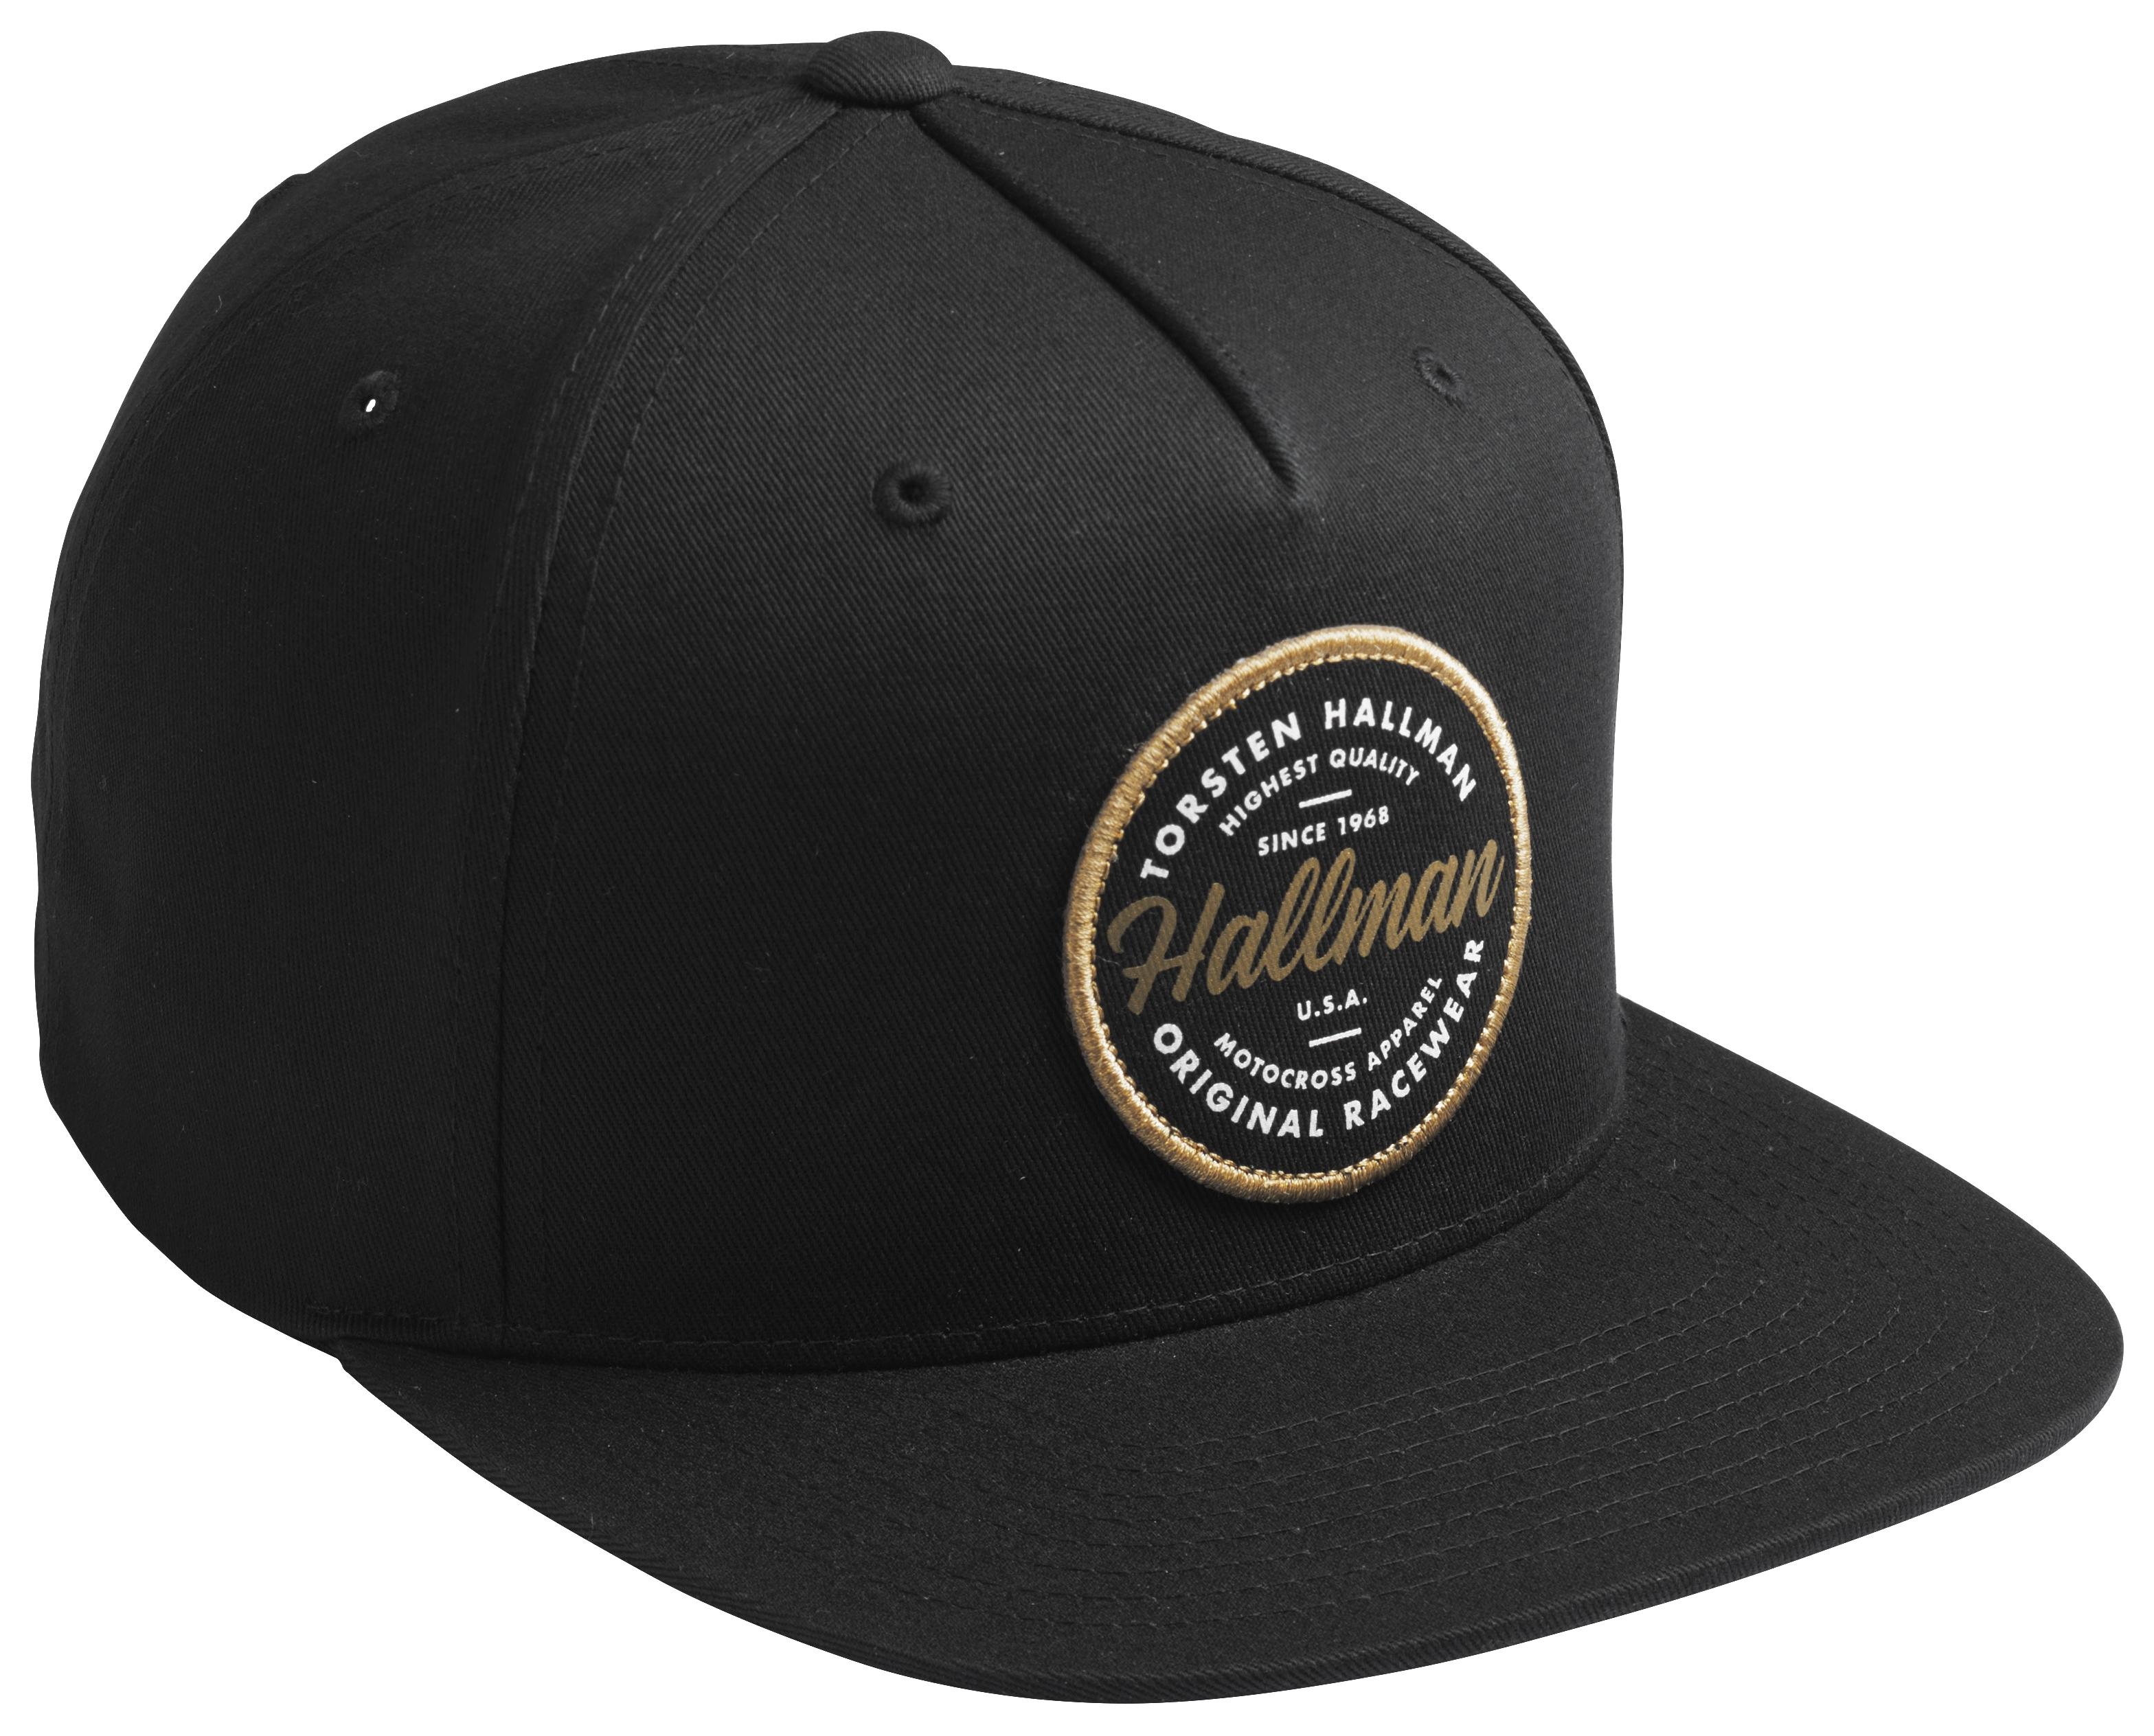 f5c2f569eb771 Thor Hallman Traditions Snapback Hat - RevZilla